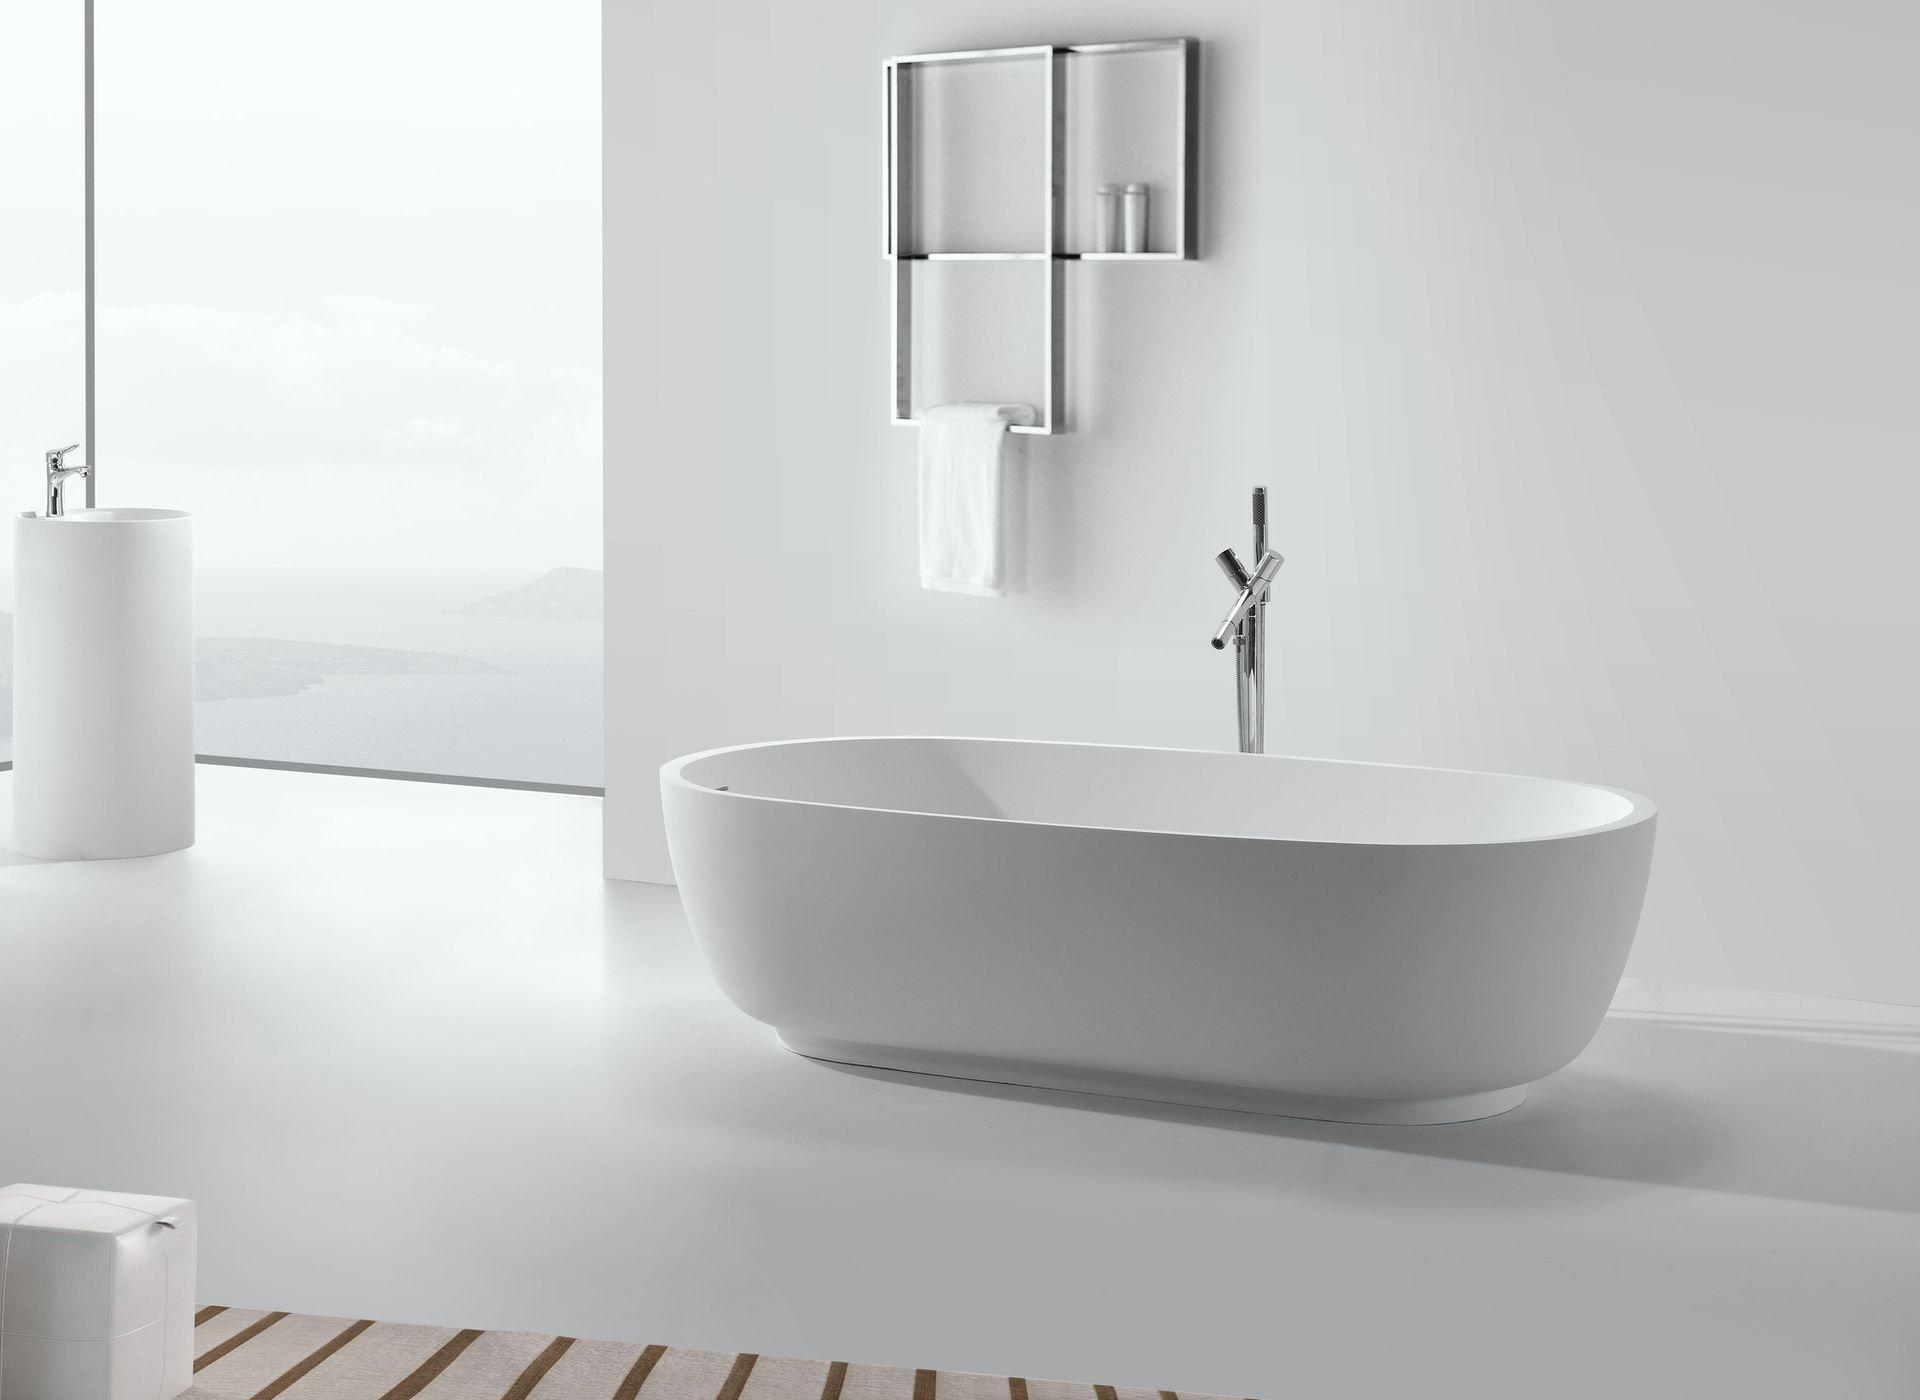 mineralguss badewanne affuso freistehend glasdeals. Black Bedroom Furniture Sets. Home Design Ideas